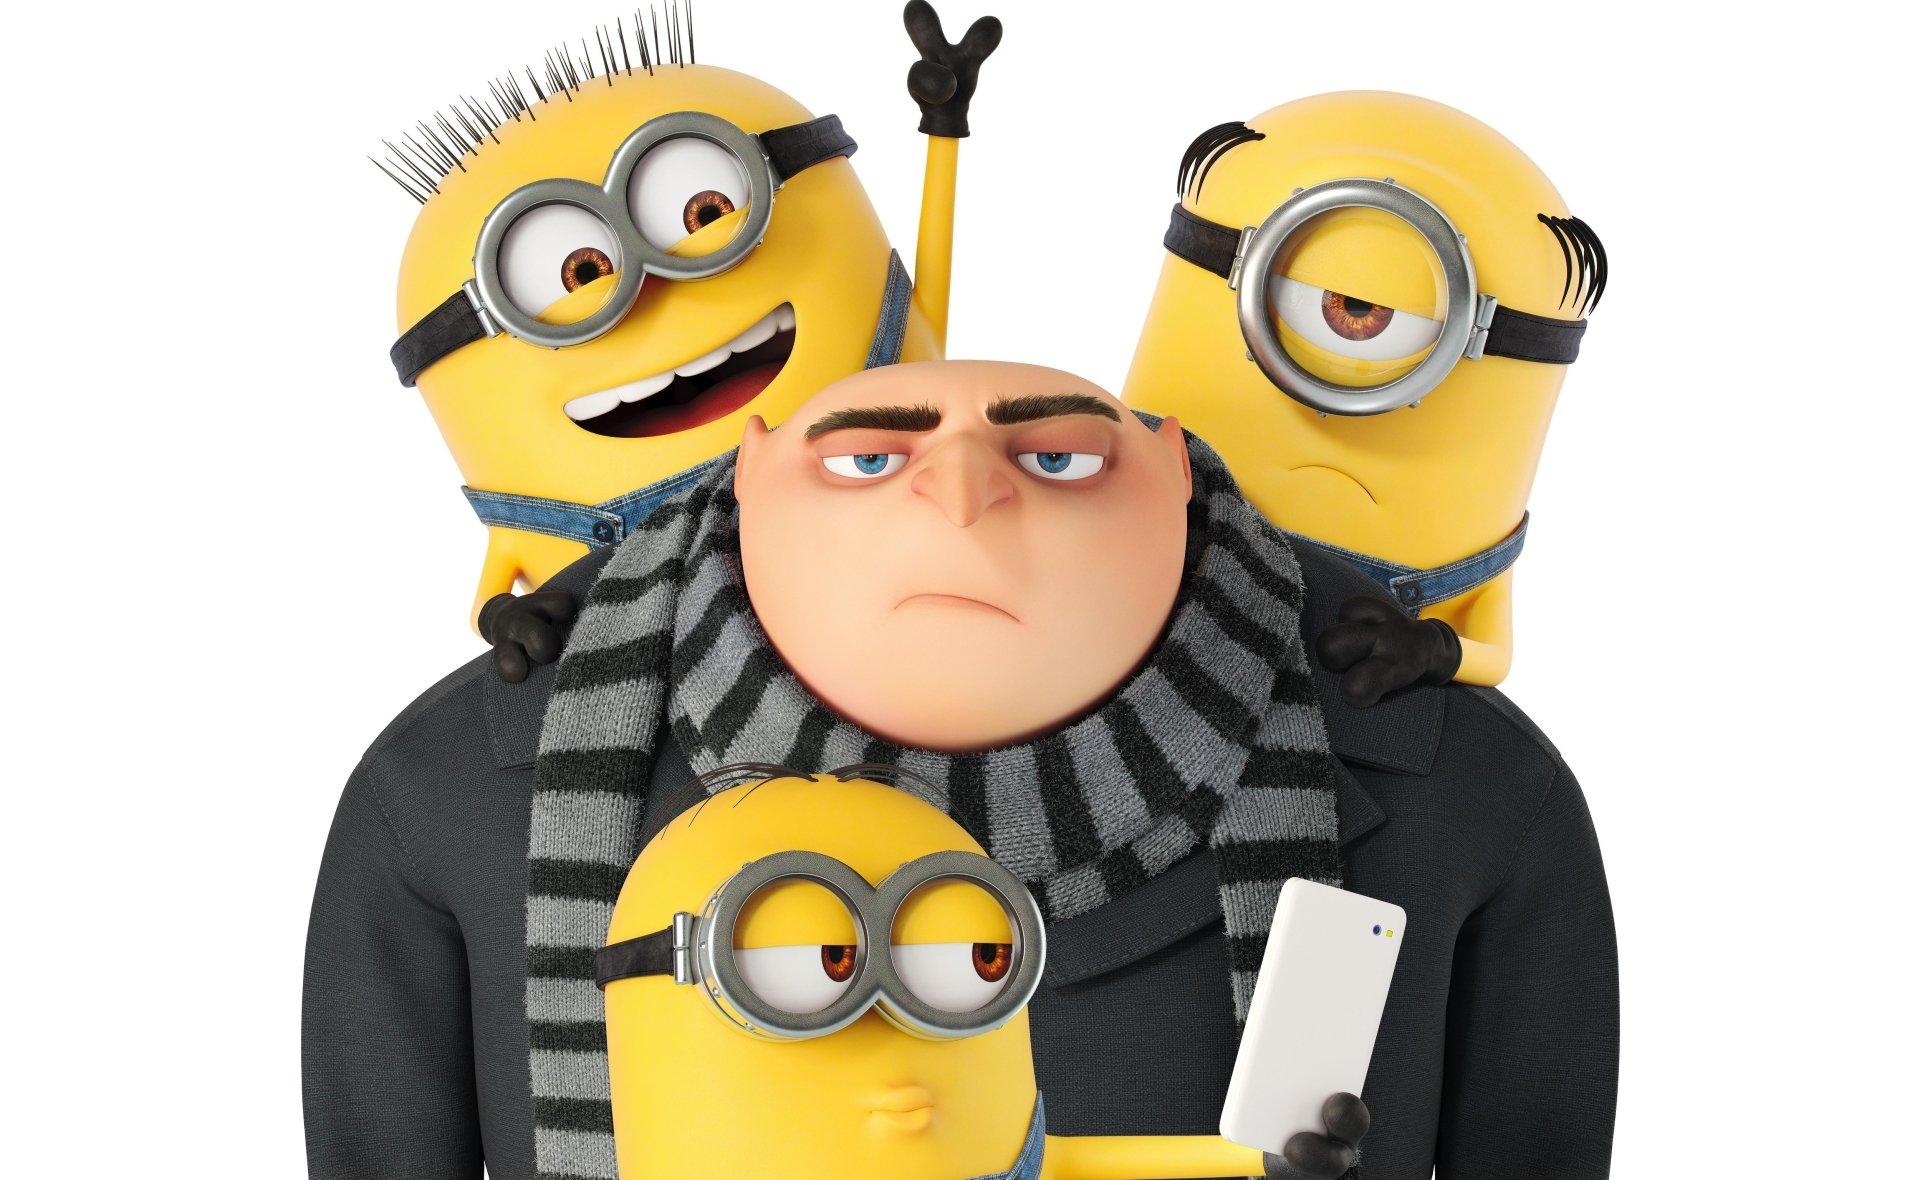 Movie - Despicable Me 3  Gru (Despicable Me) Stuart (Minions) Bob (Minions) Kevin (Minions) Wallpaper